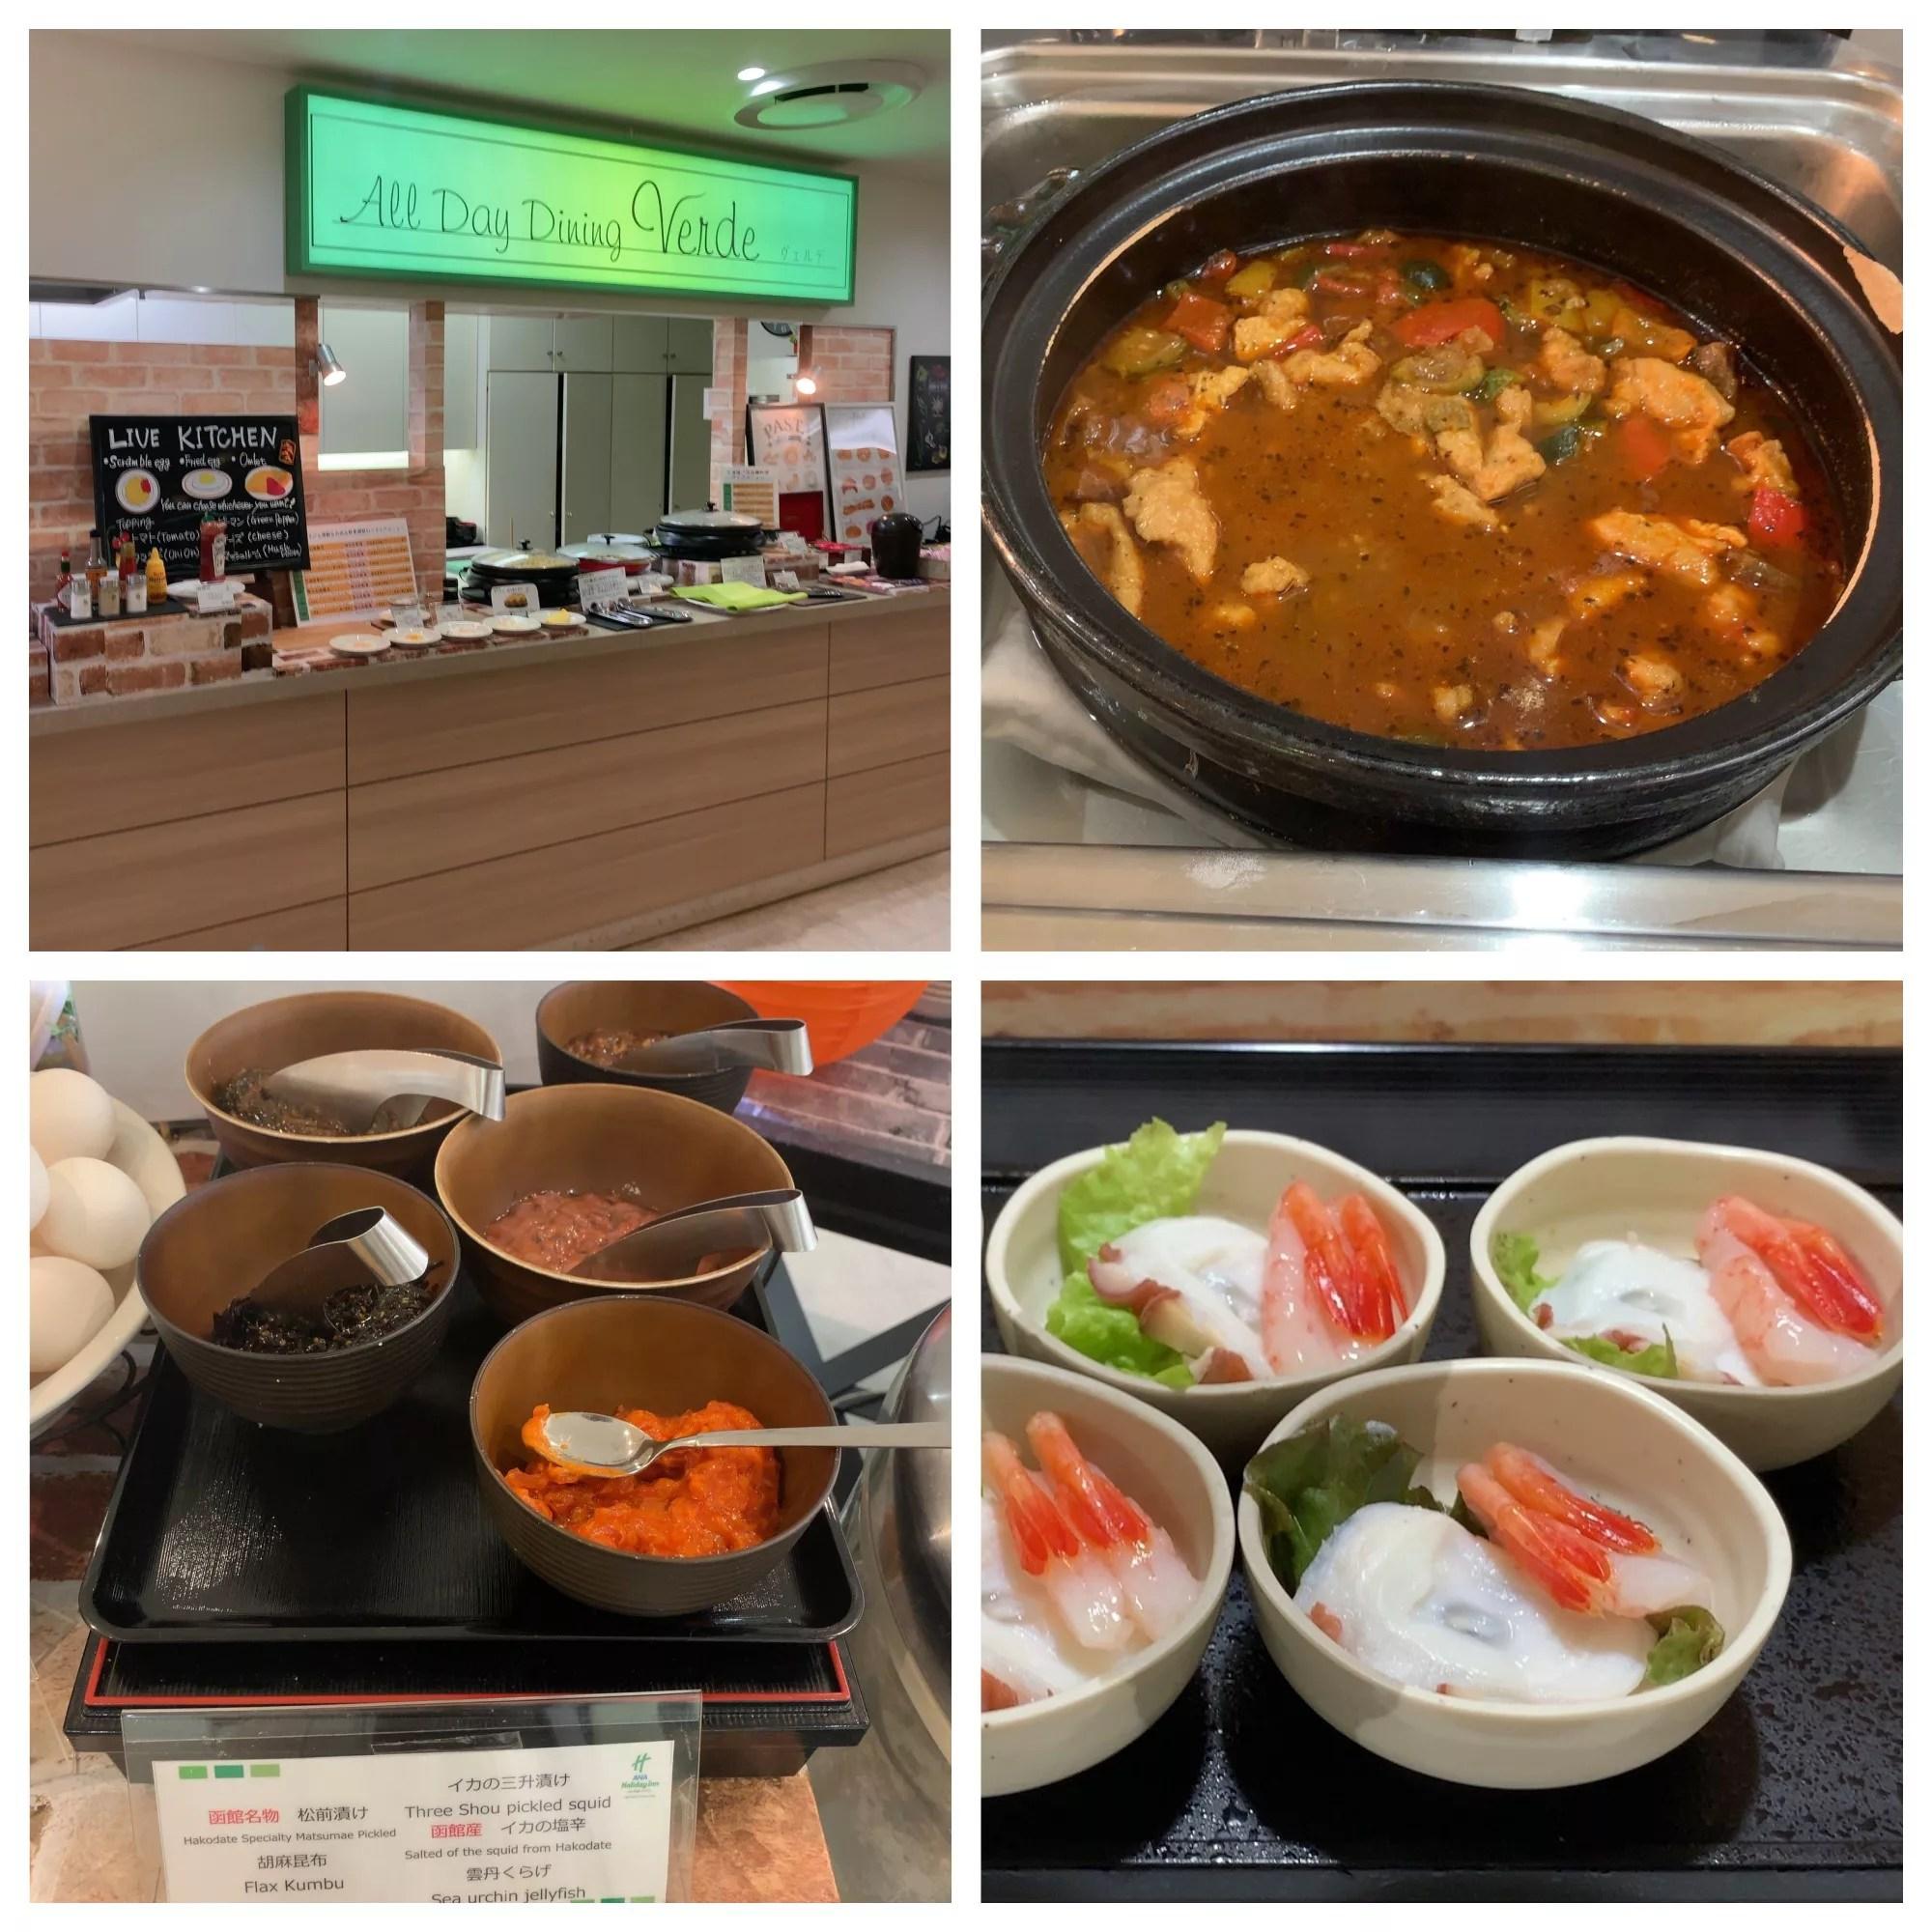 ANAホリデイイン札幌すすきのヴェルデ朝食ビュッフェ全メニュー紹介